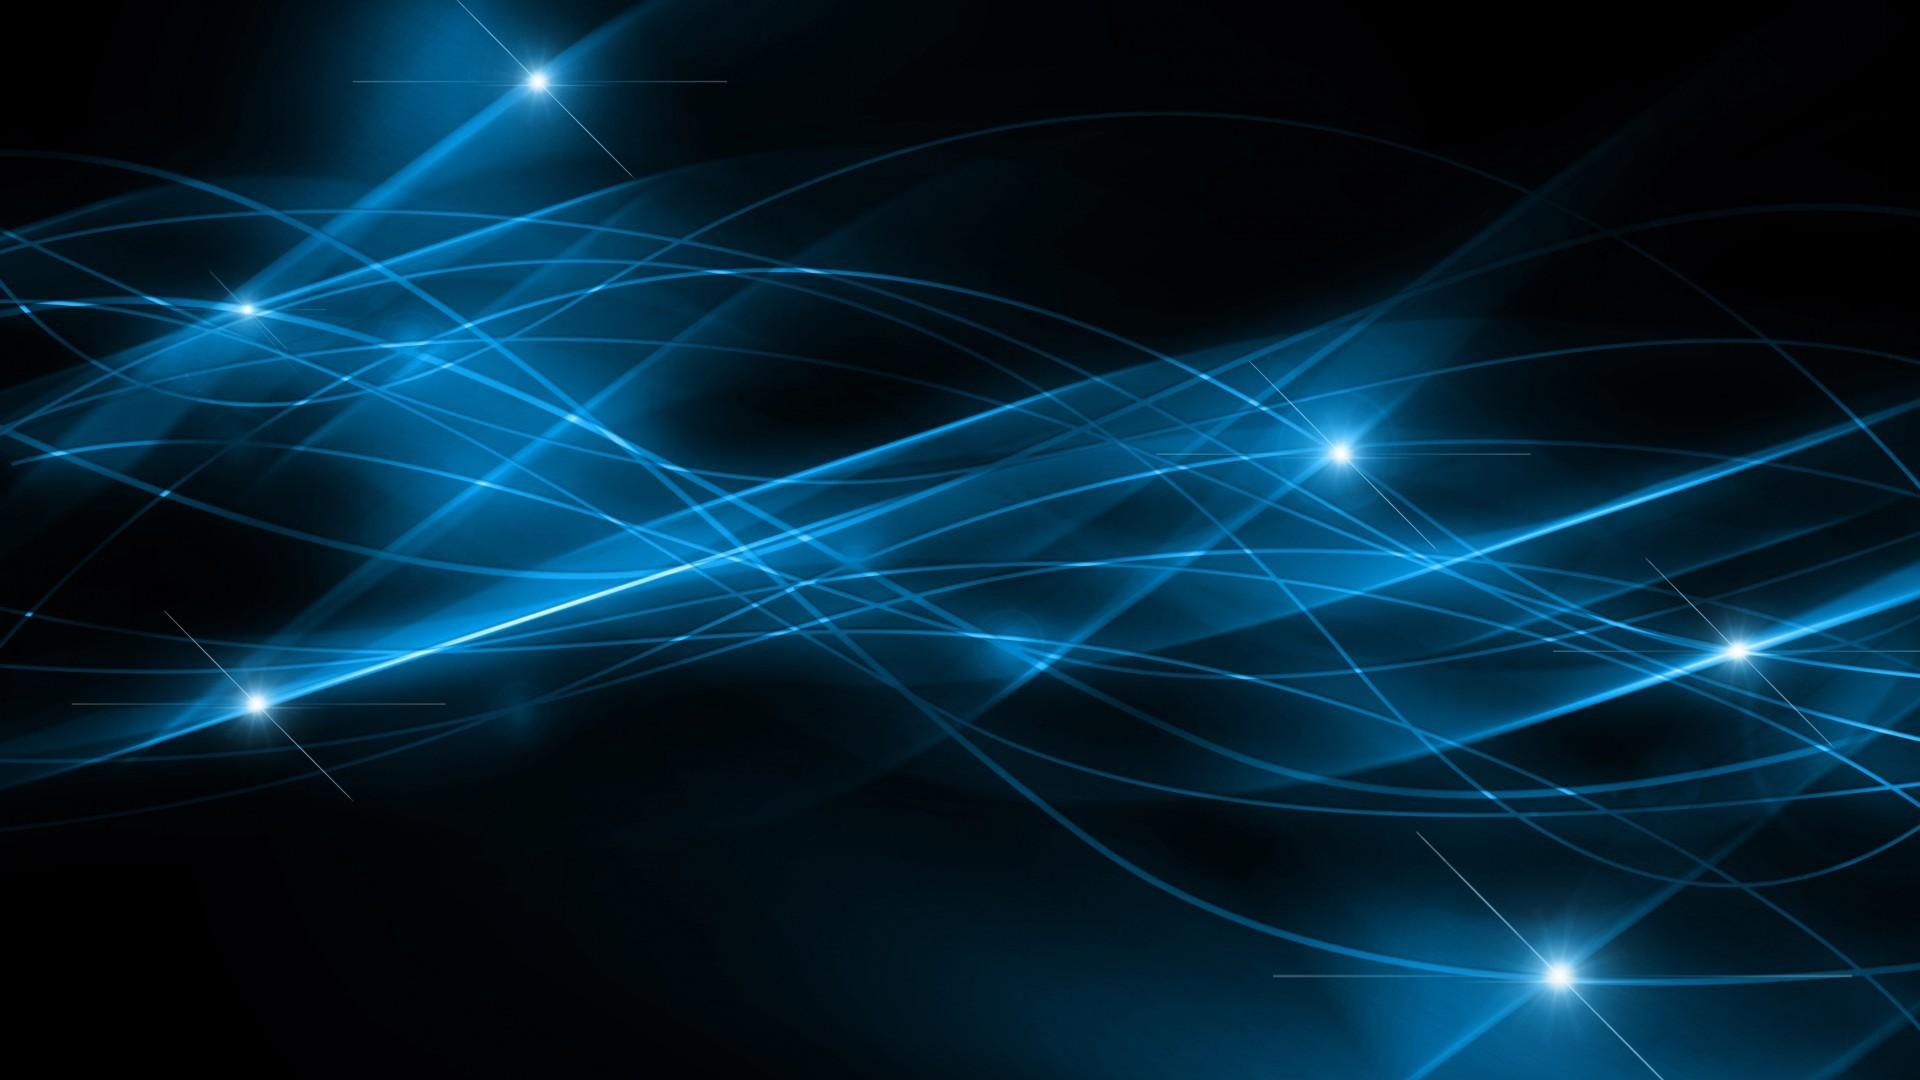 2560x1600 Black And Blue Hd Wallpaper 11 Hd Wallpaper